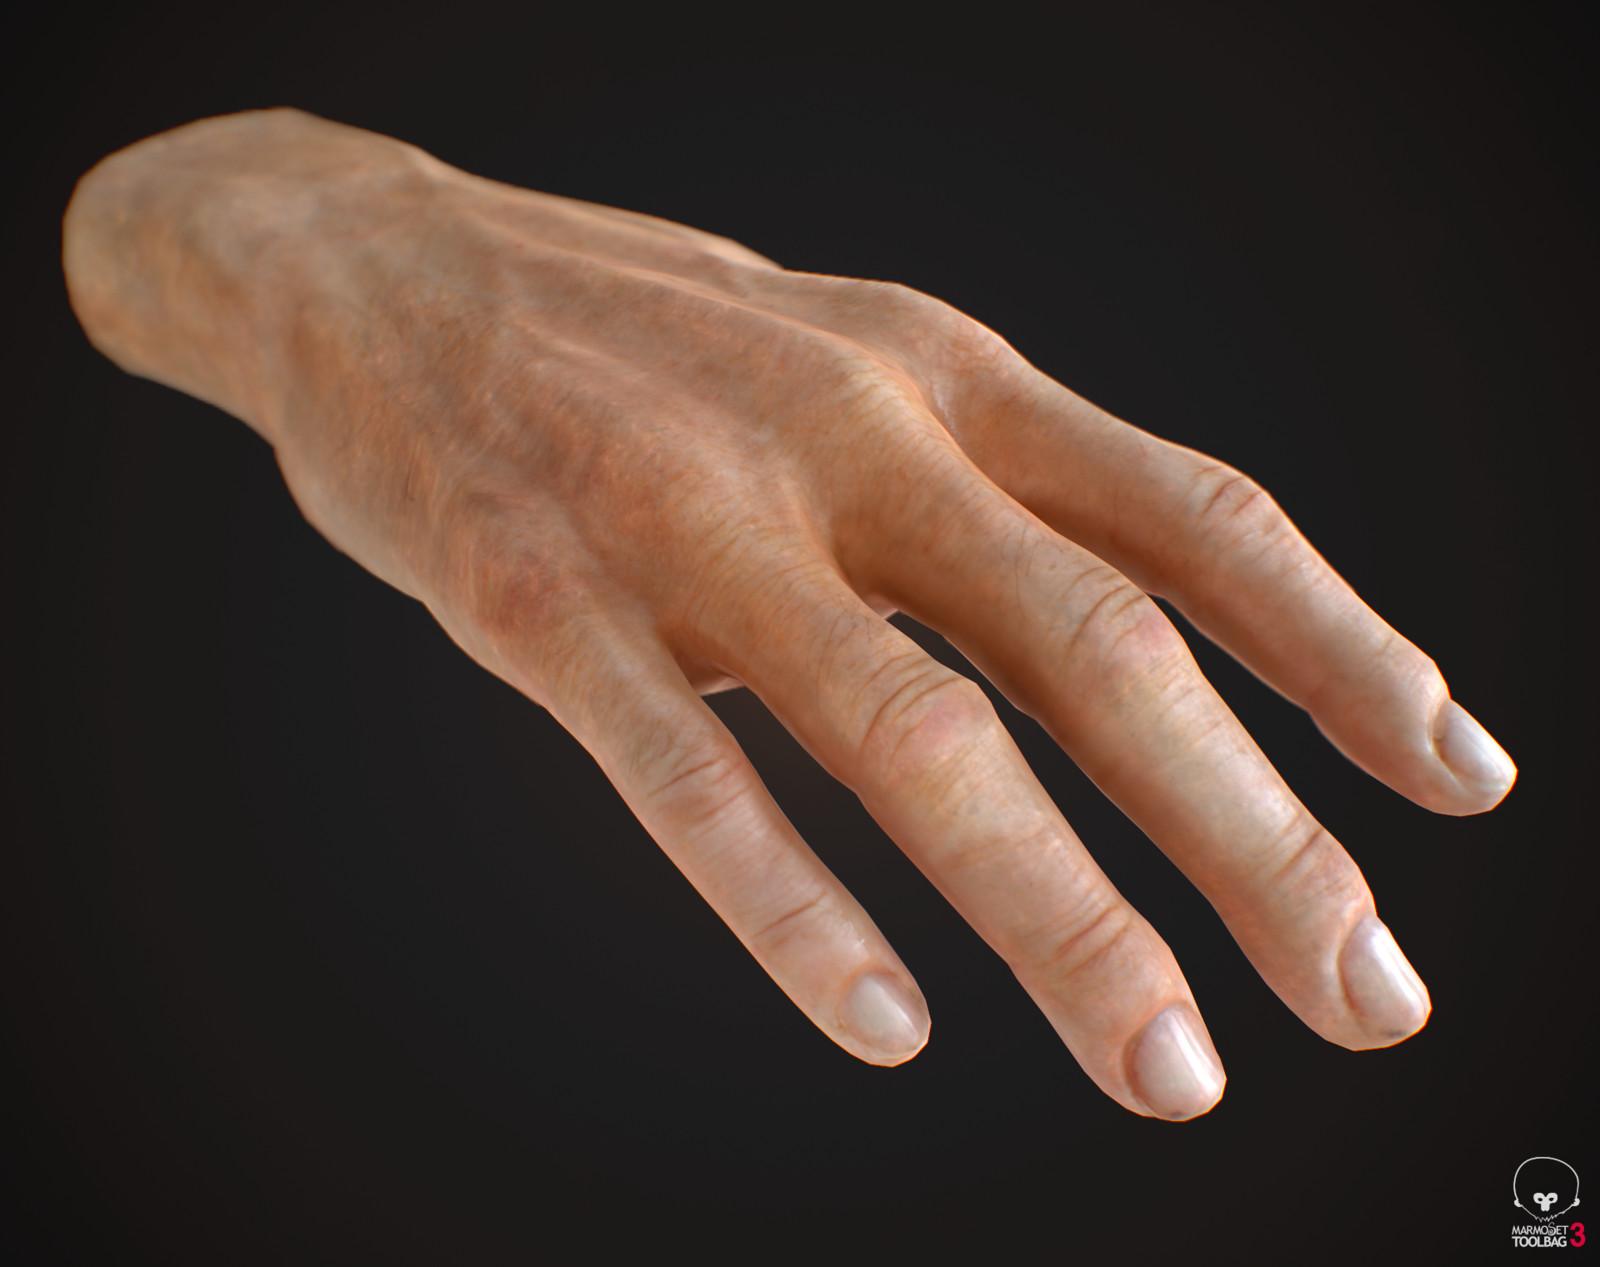 VR HAND - RUNES THE FORGOTTEN PATH